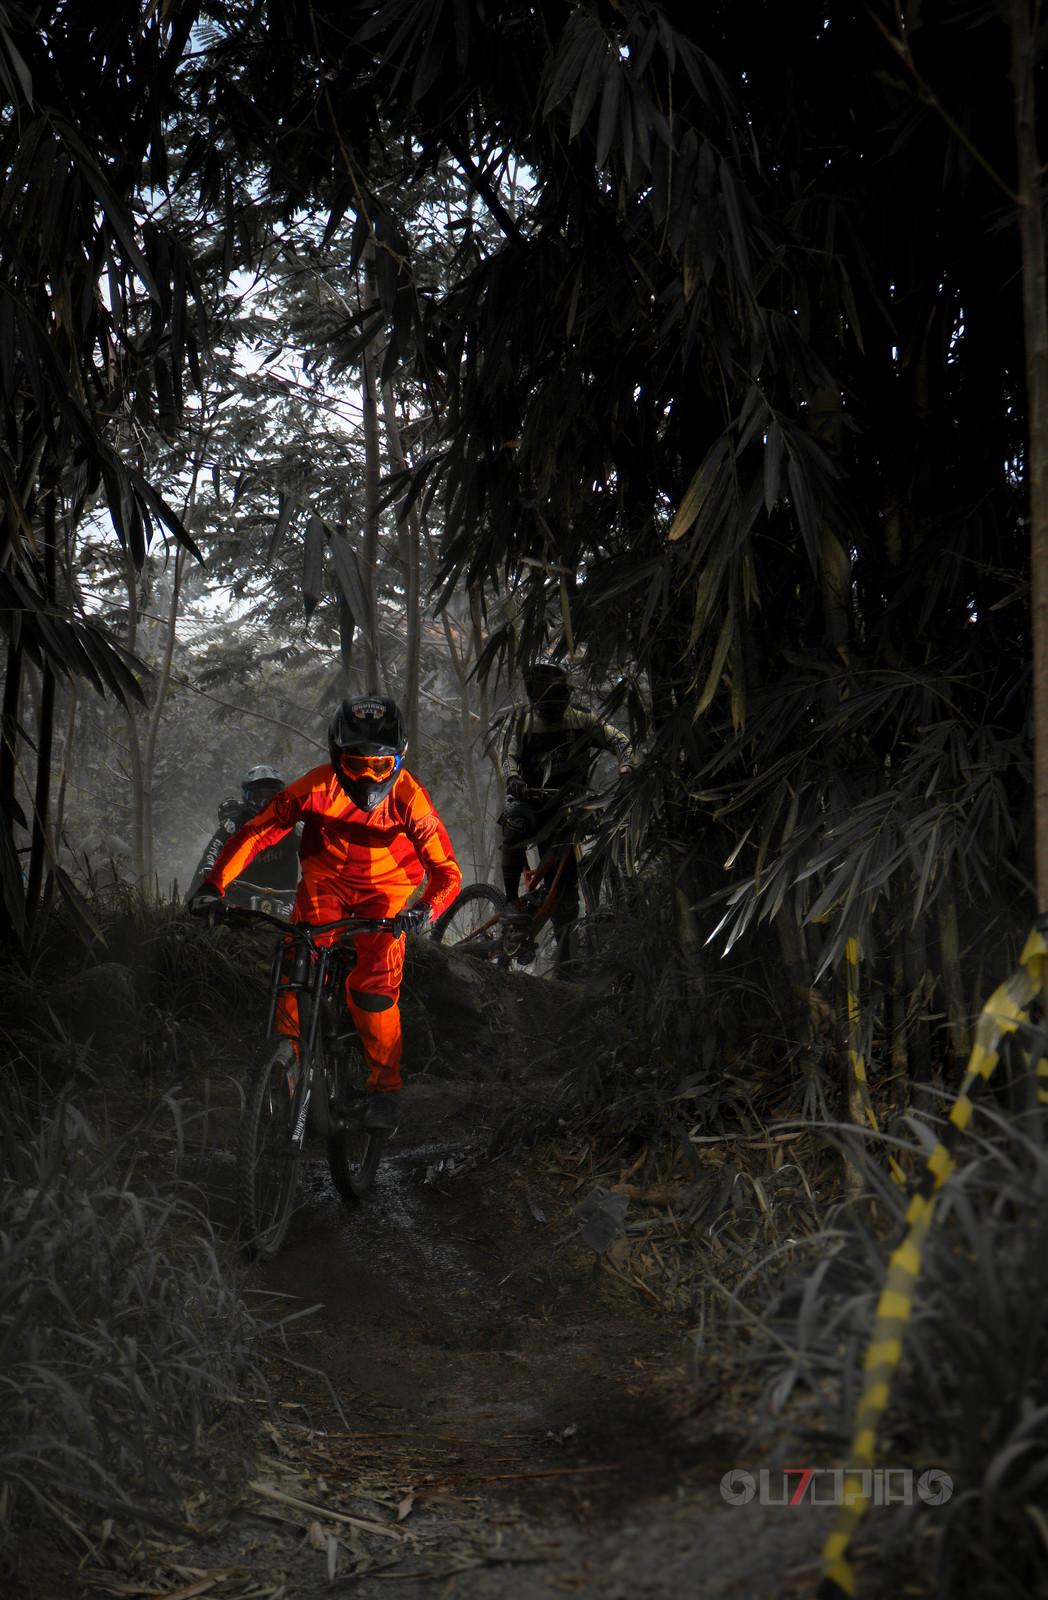 Legend  - utopiaarch - Mountain Biking Pictures - Vital MTB